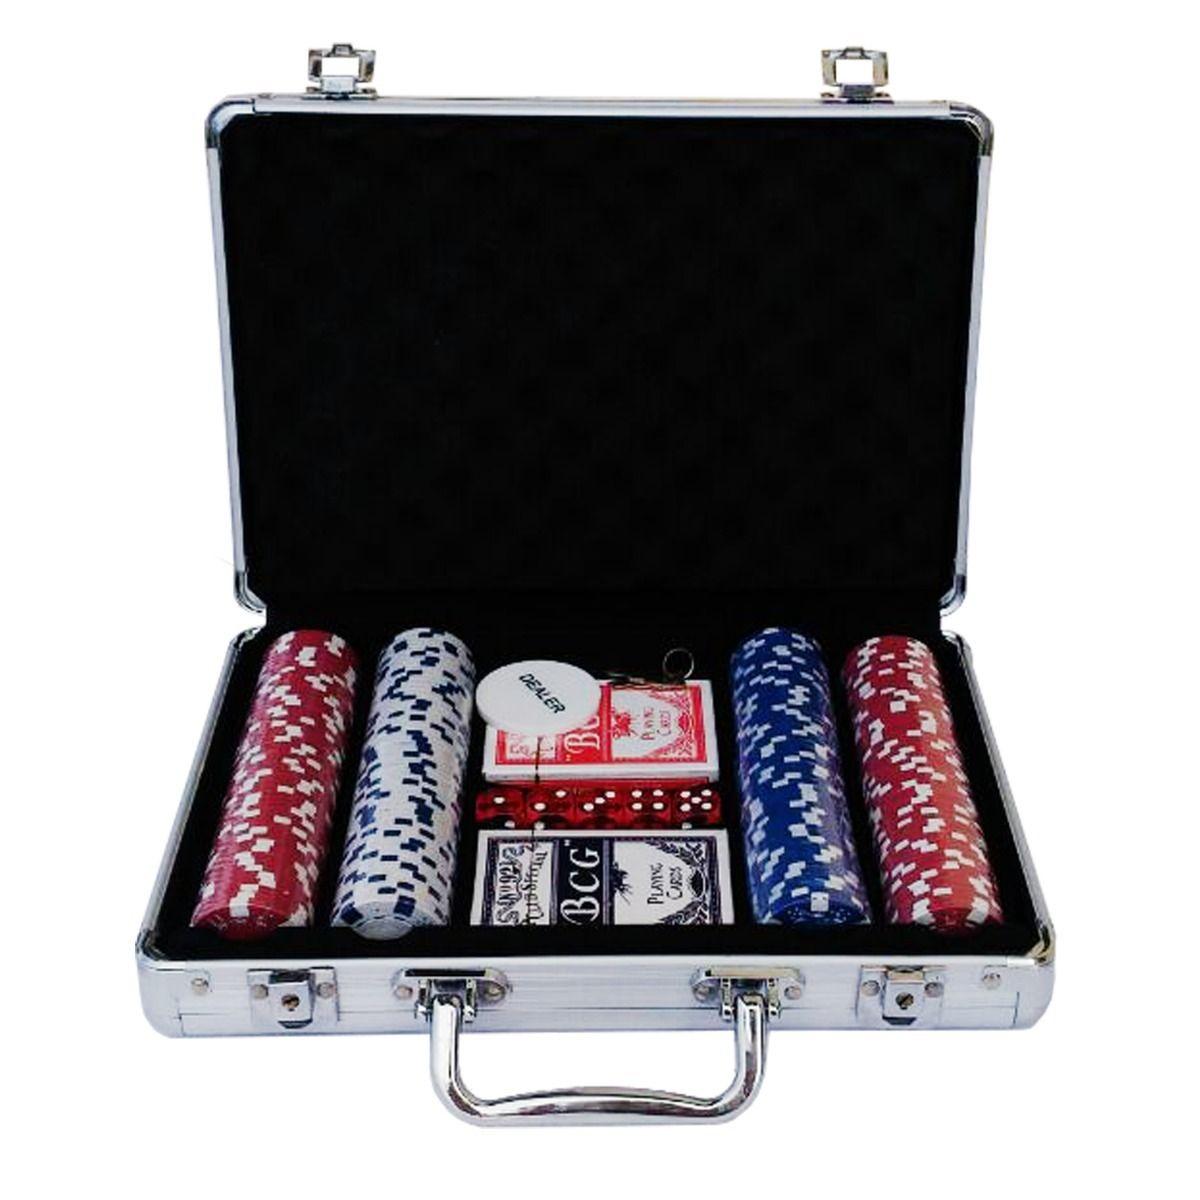 Maleta Poker Profissional 300 Fichas Numerada